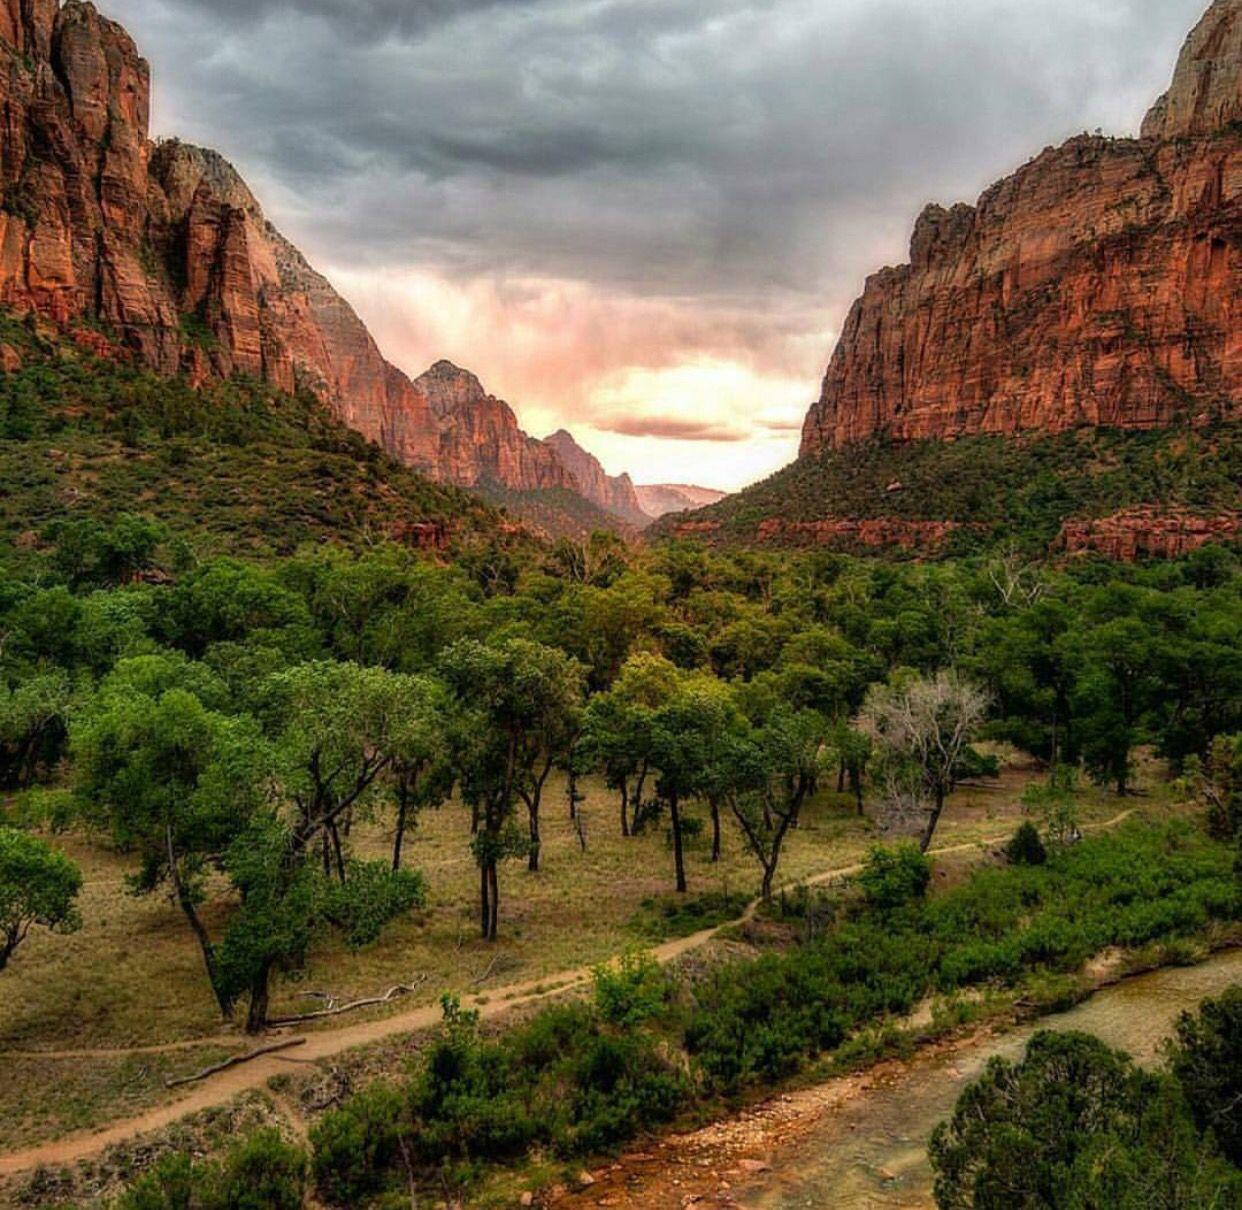 Beautiful day in Zion National Park @hermans.joris #nature